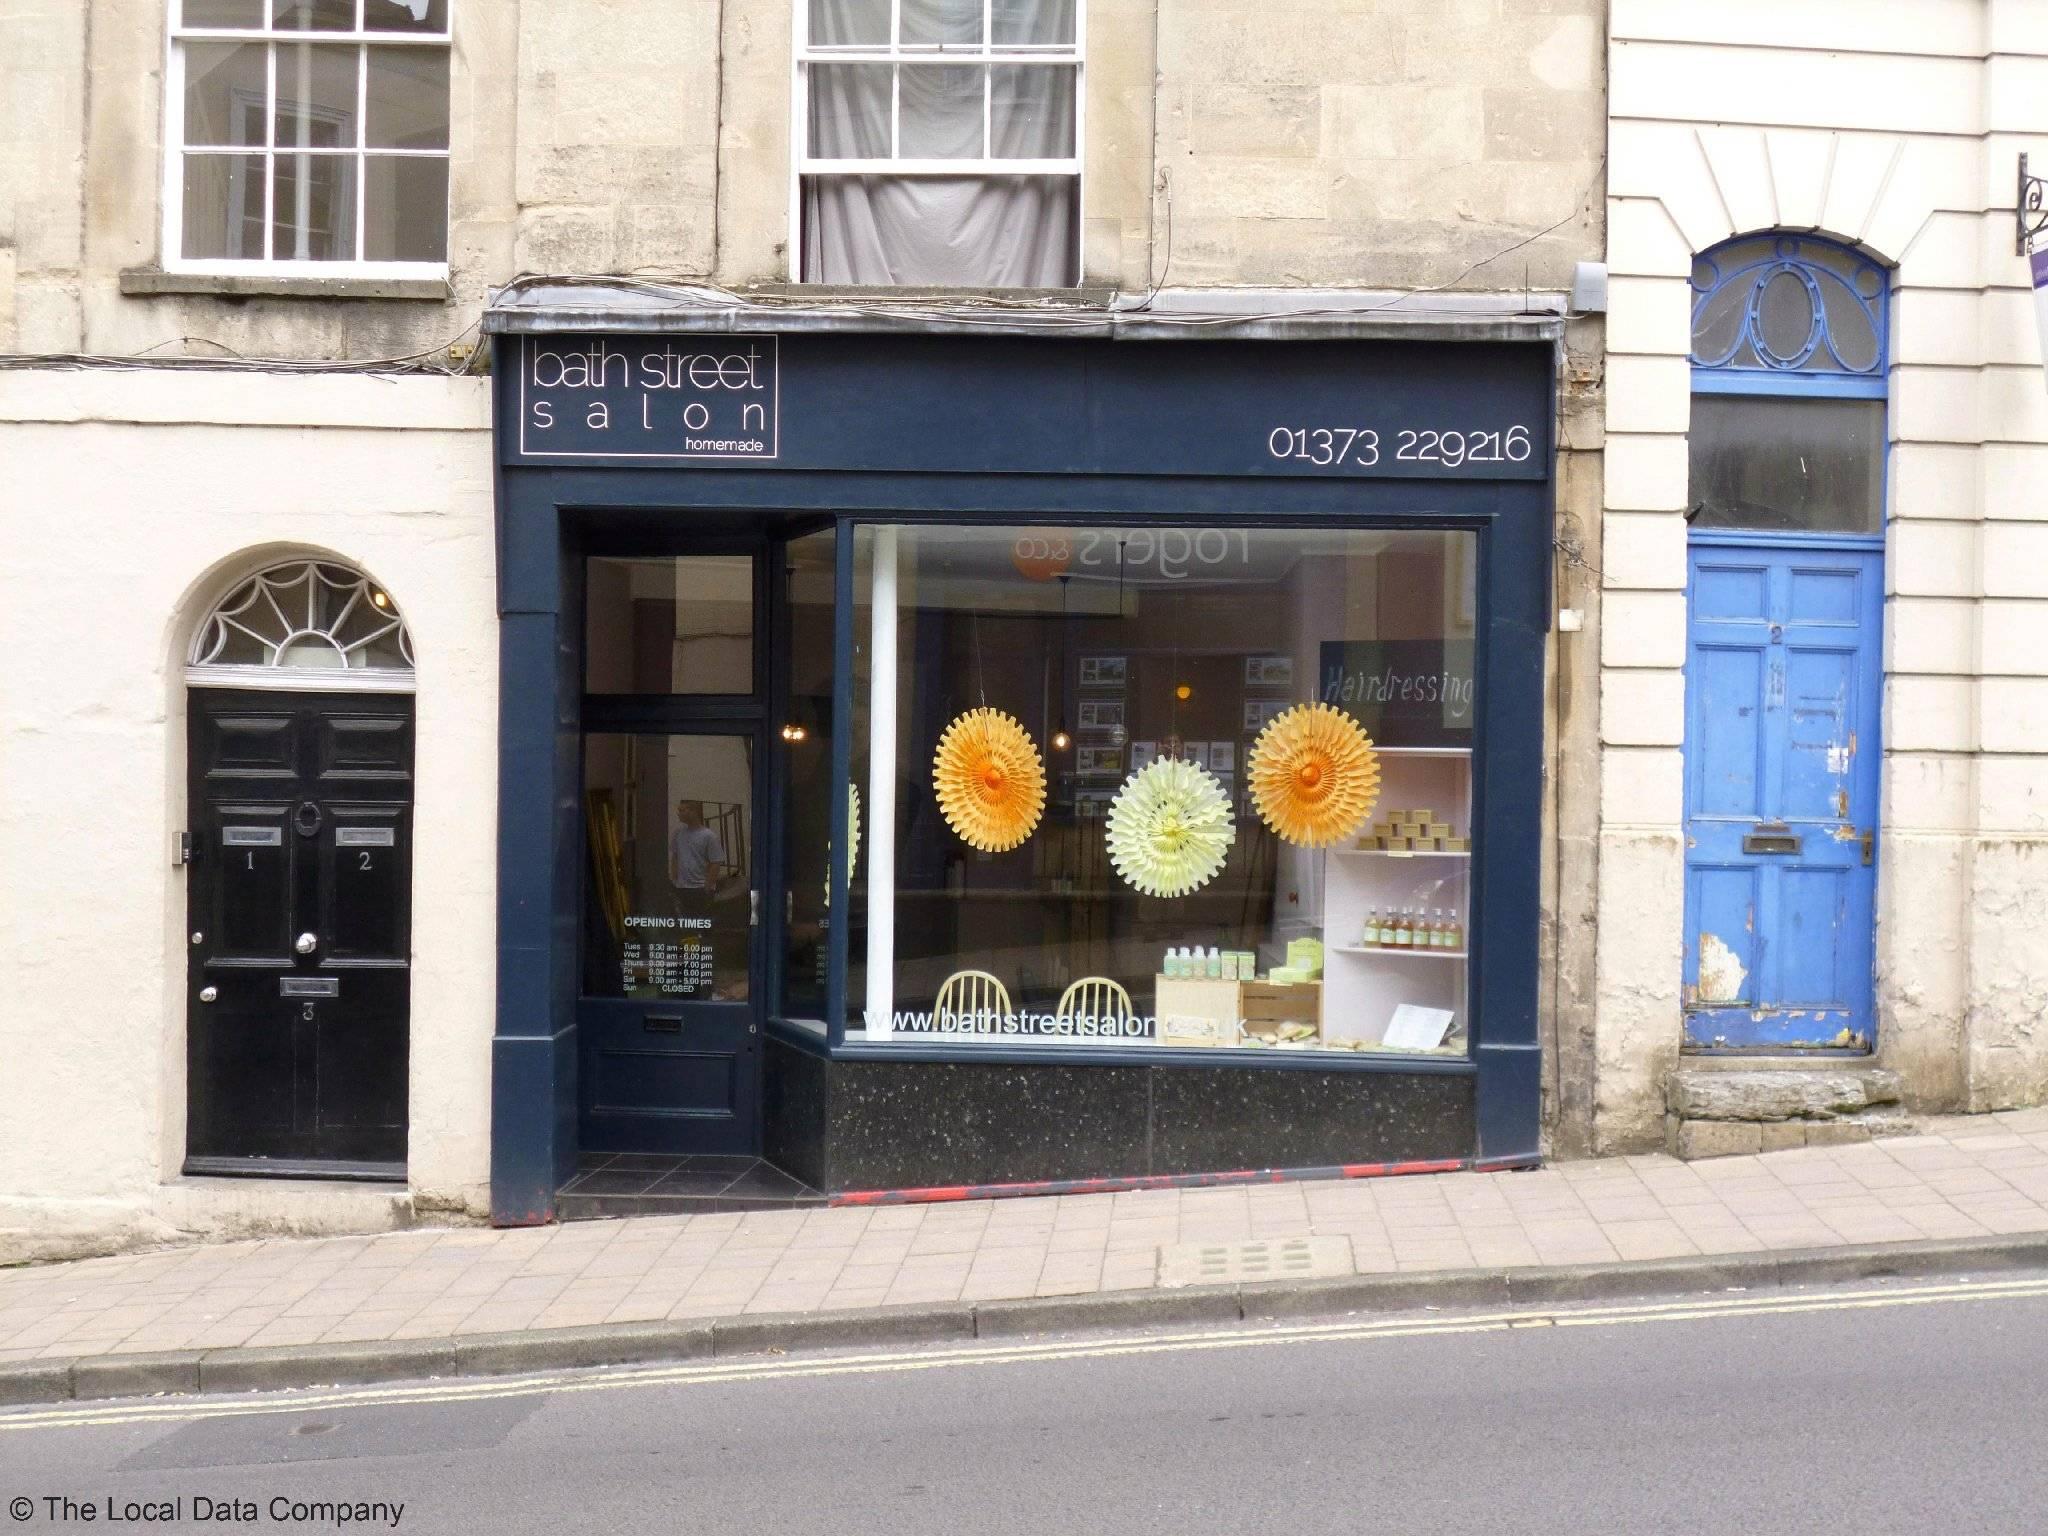 Bath Street Salon